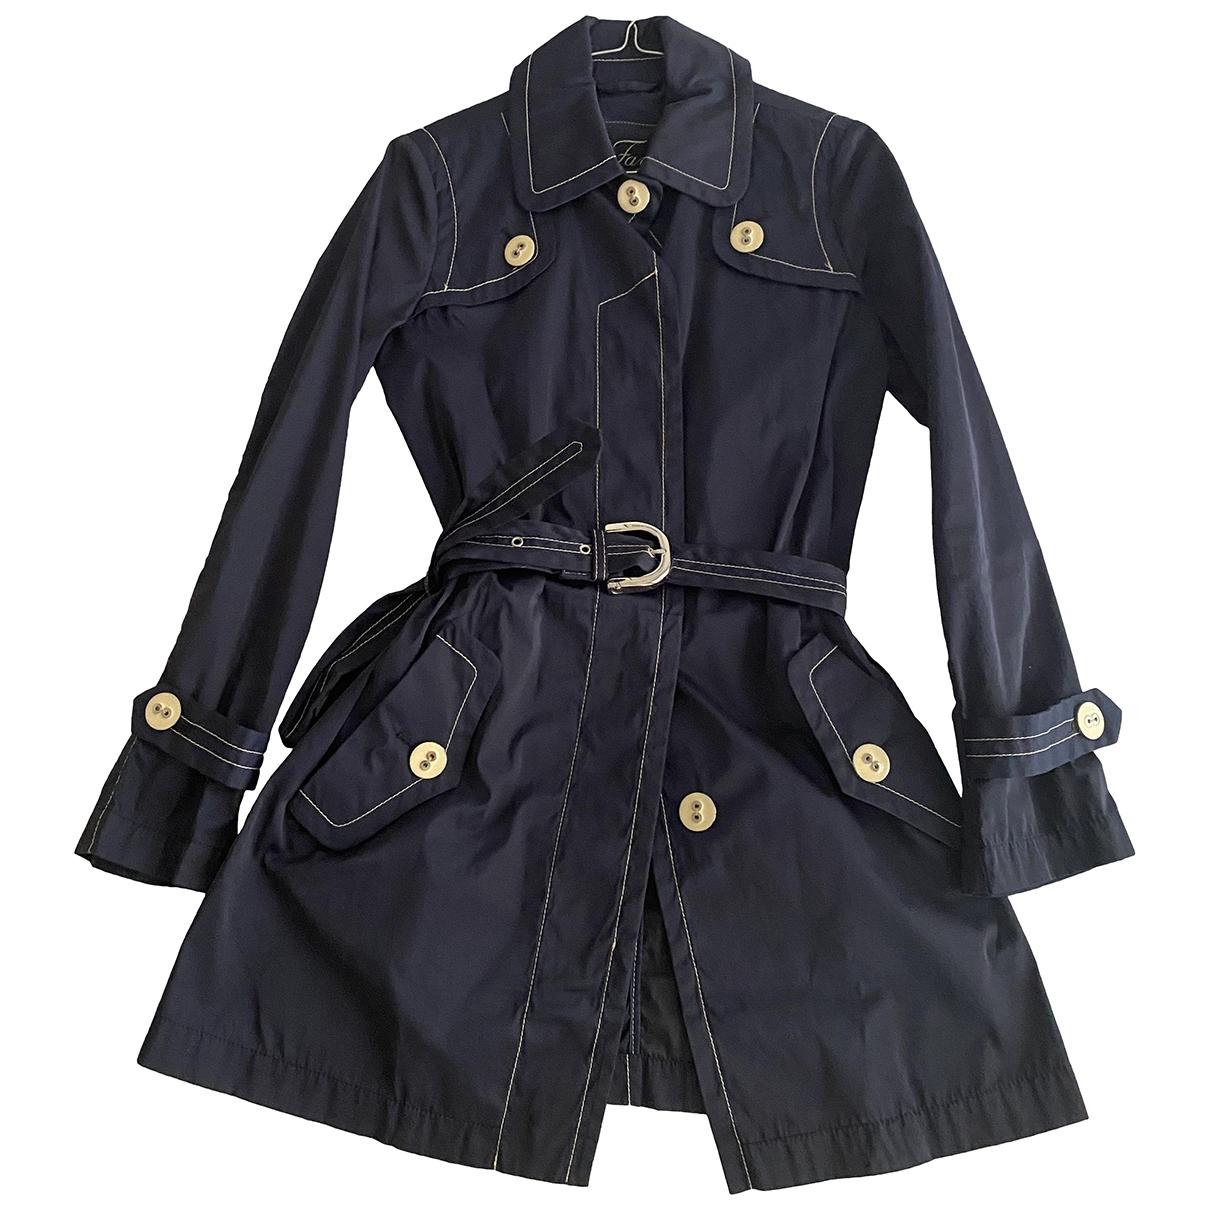 Fay \N Blue Trench coat for Women XS International